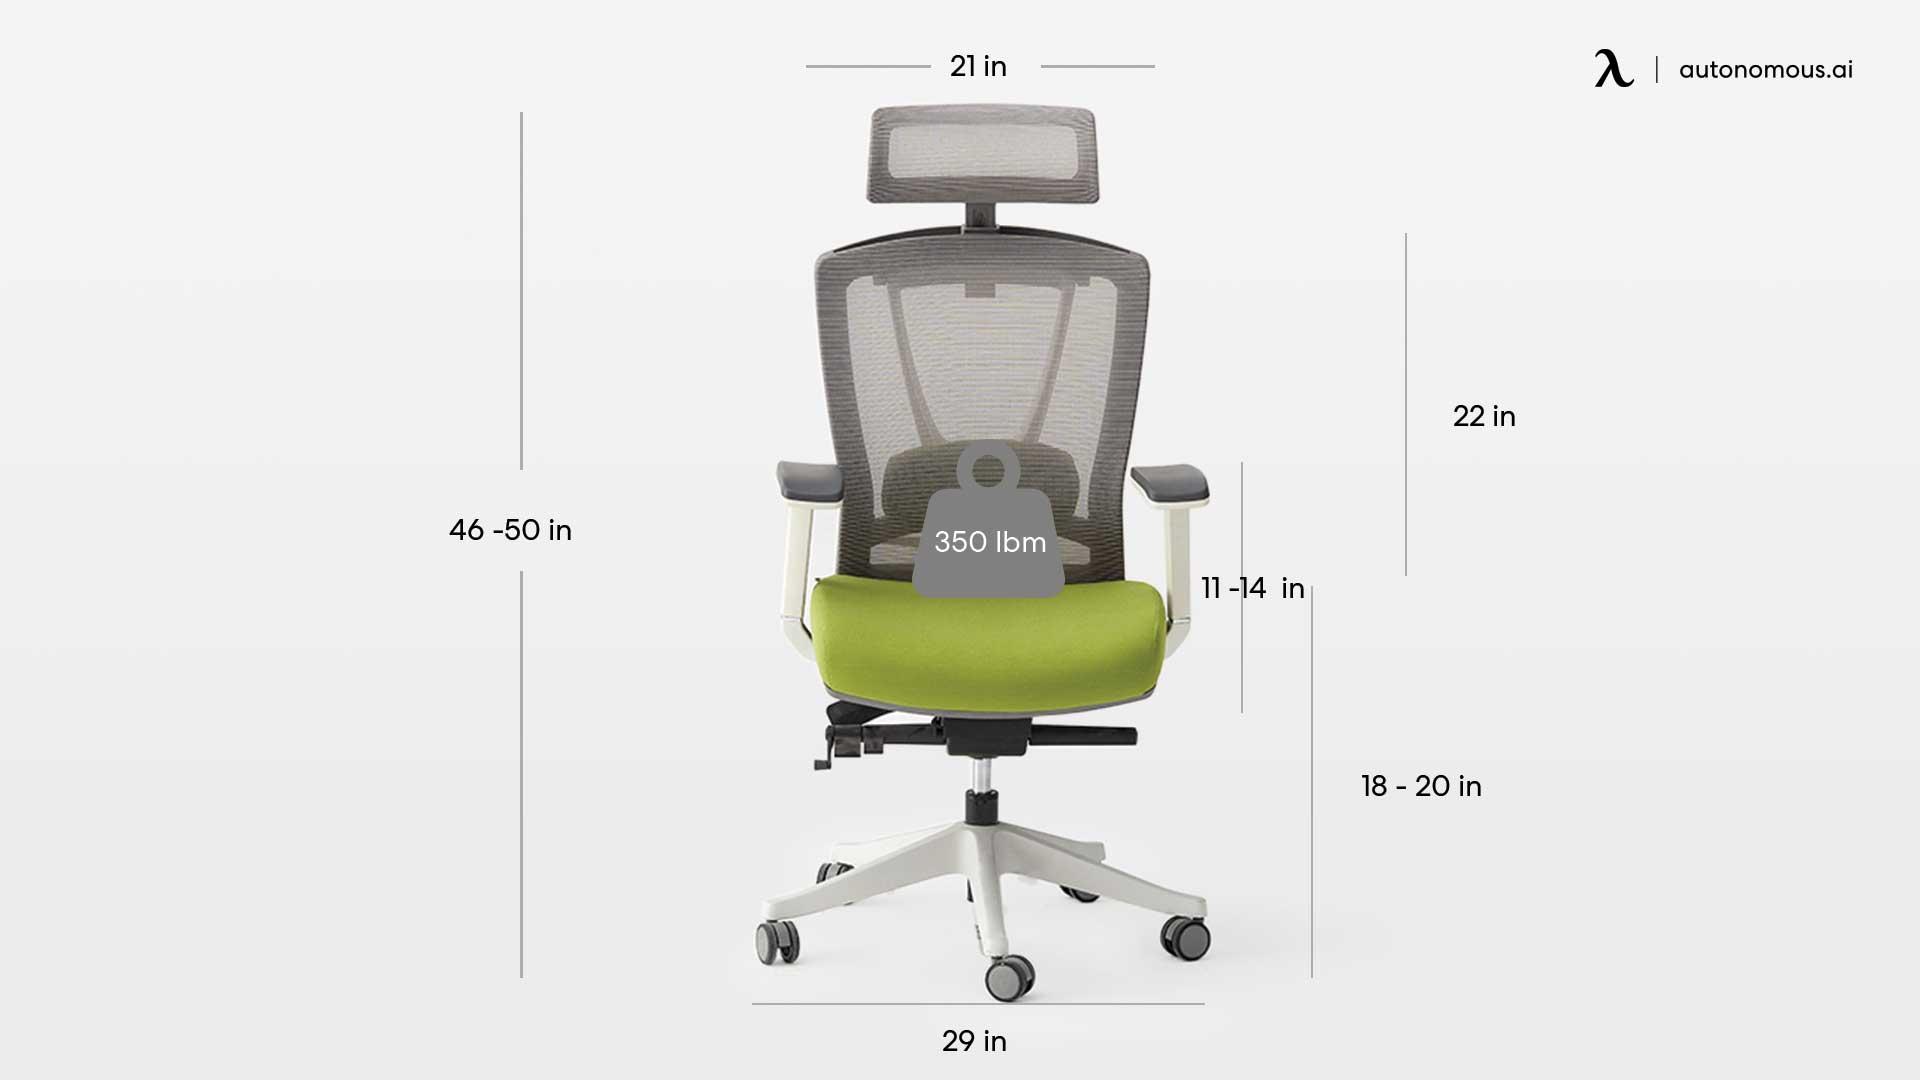 image relates to Ergo chair 2 specs